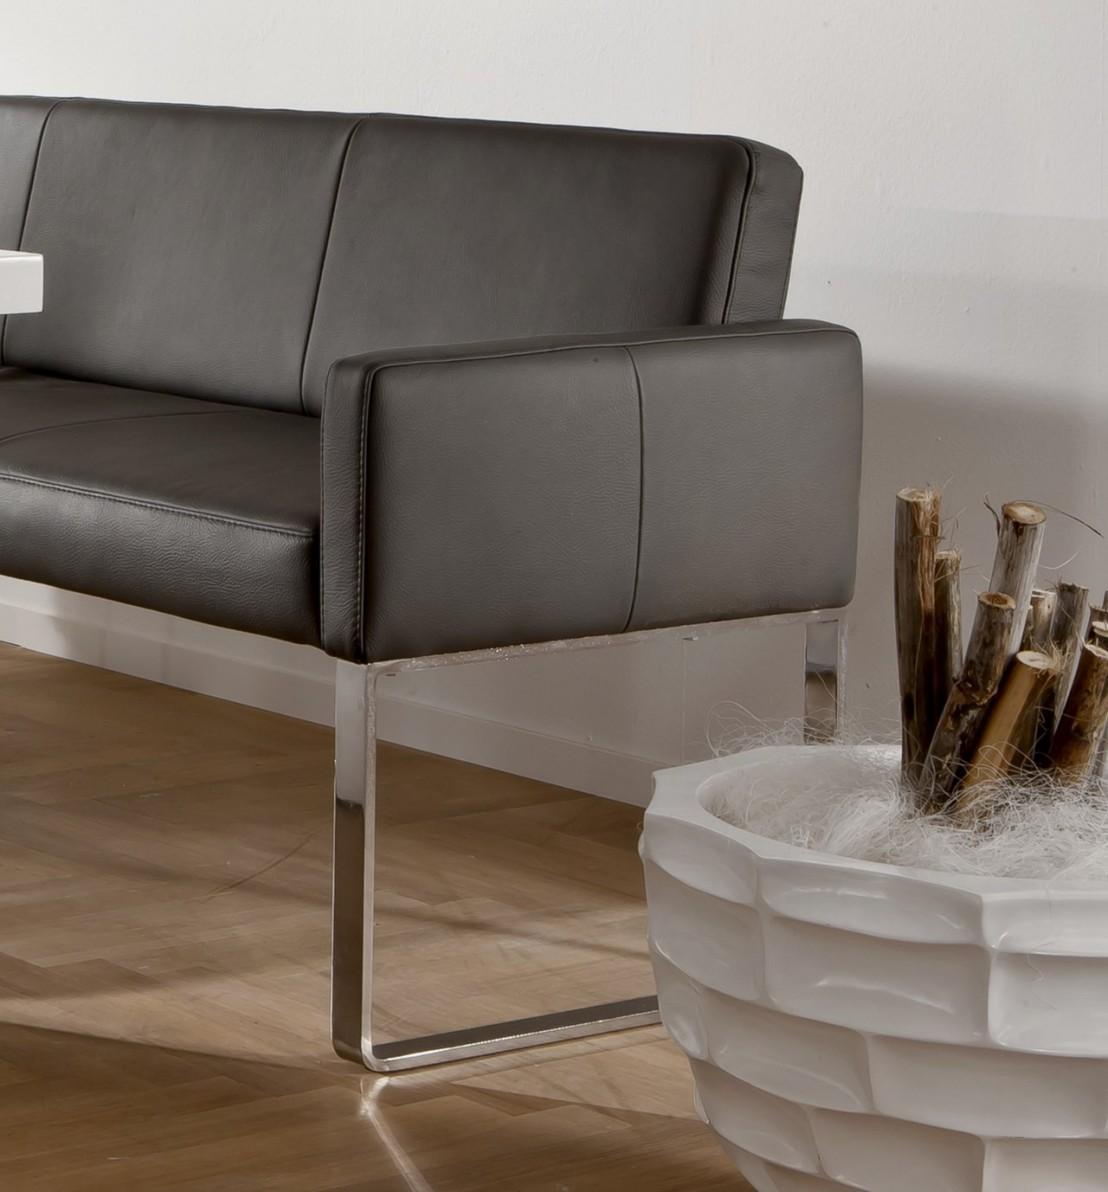 banquette d 39 angle design en cuir puredining 160 x 229 cm. Black Bedroom Furniture Sets. Home Design Ideas